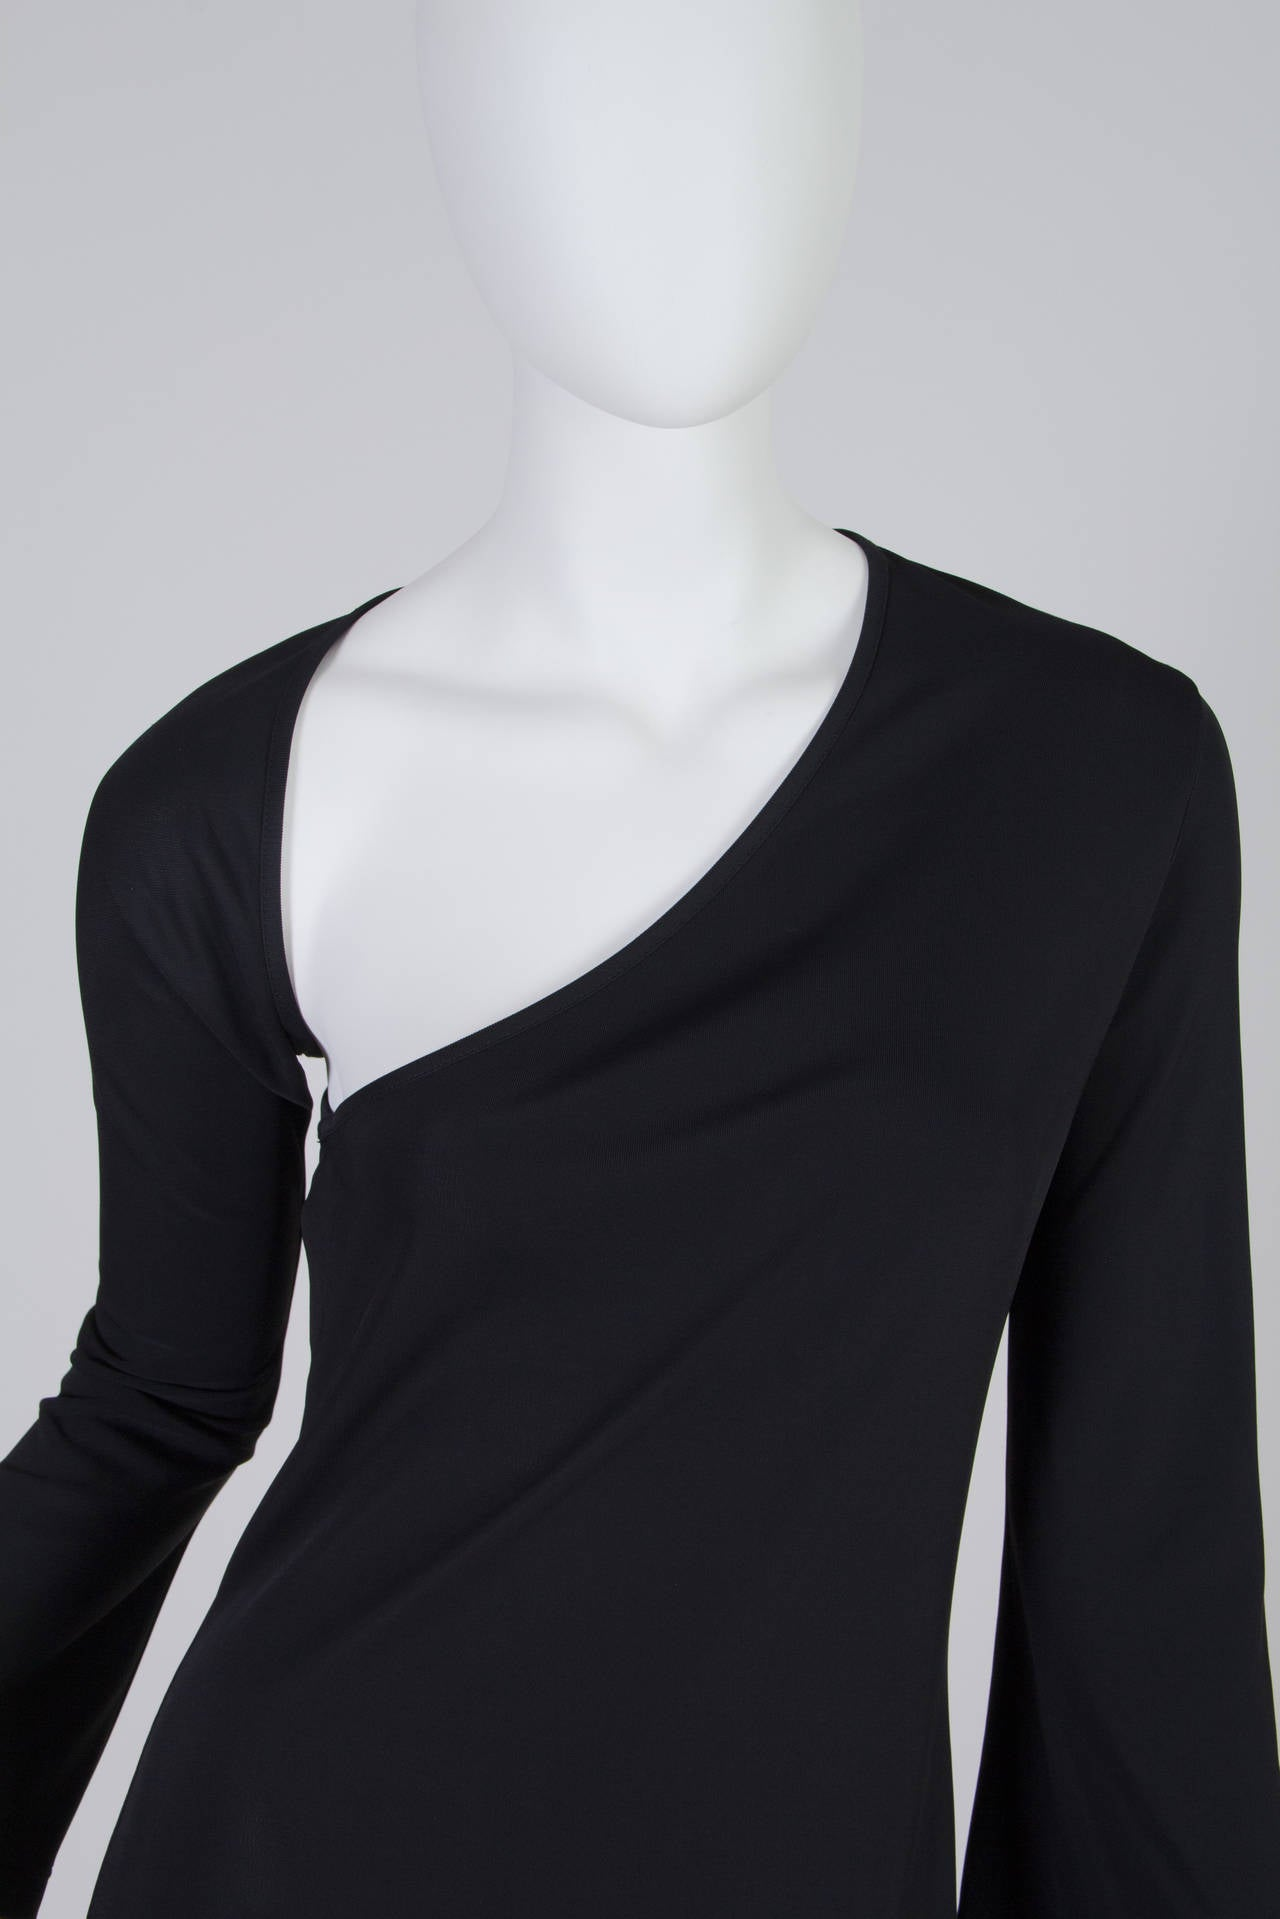 Jean Paul Gaultier Wraparound Sleeve Dress For Sale 3